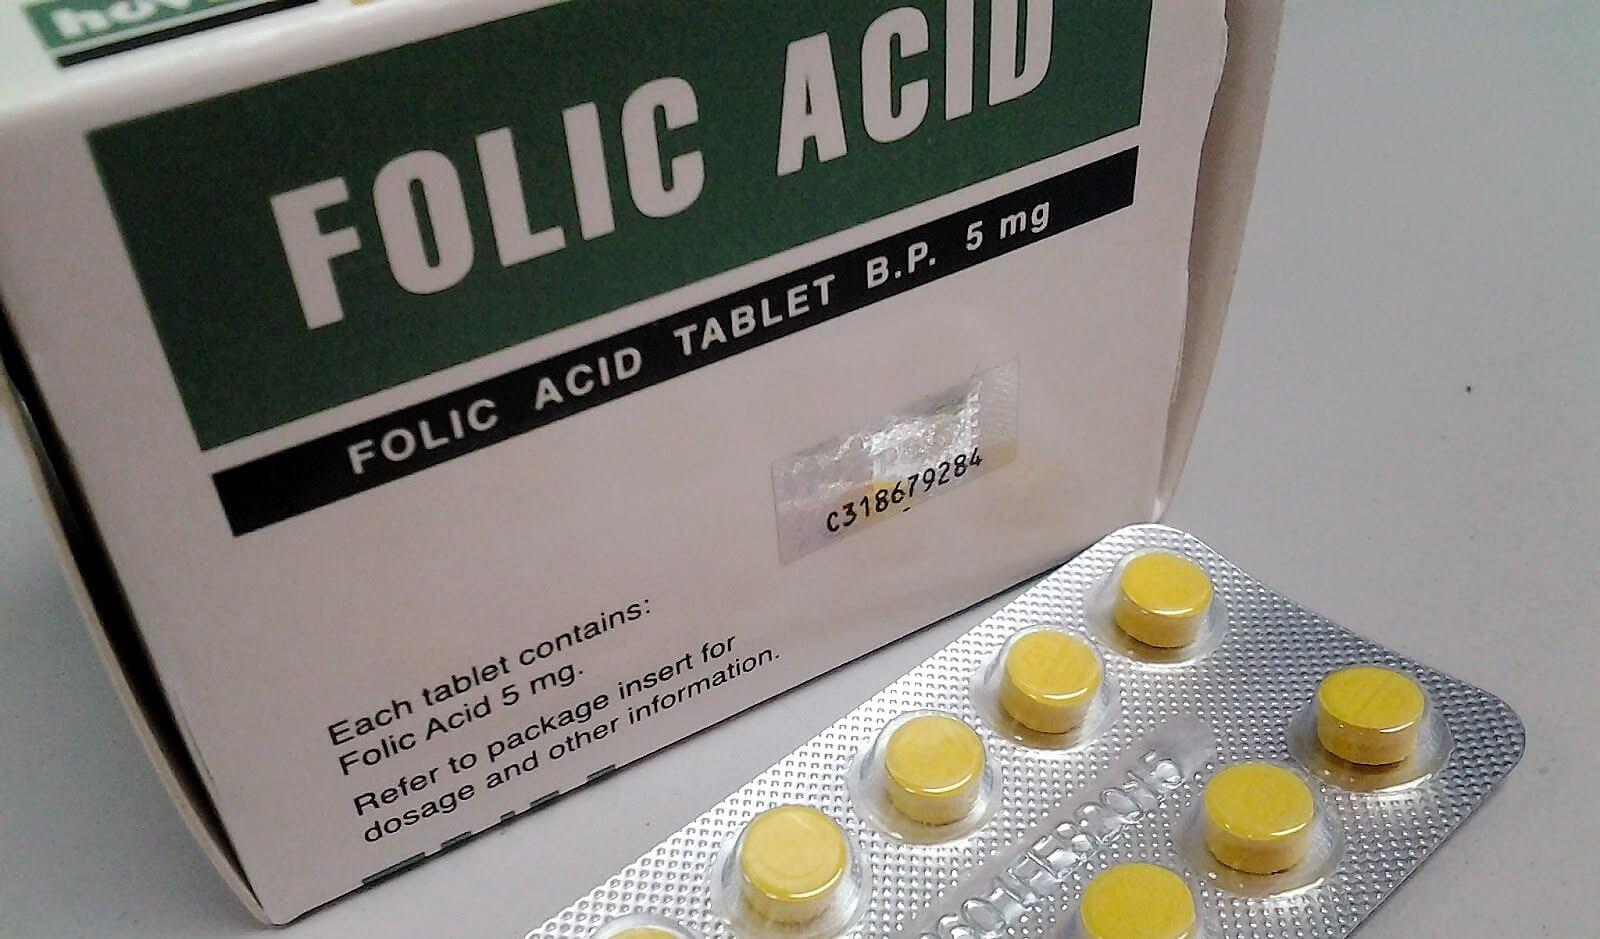 acid folik, acid folik ne shtazani